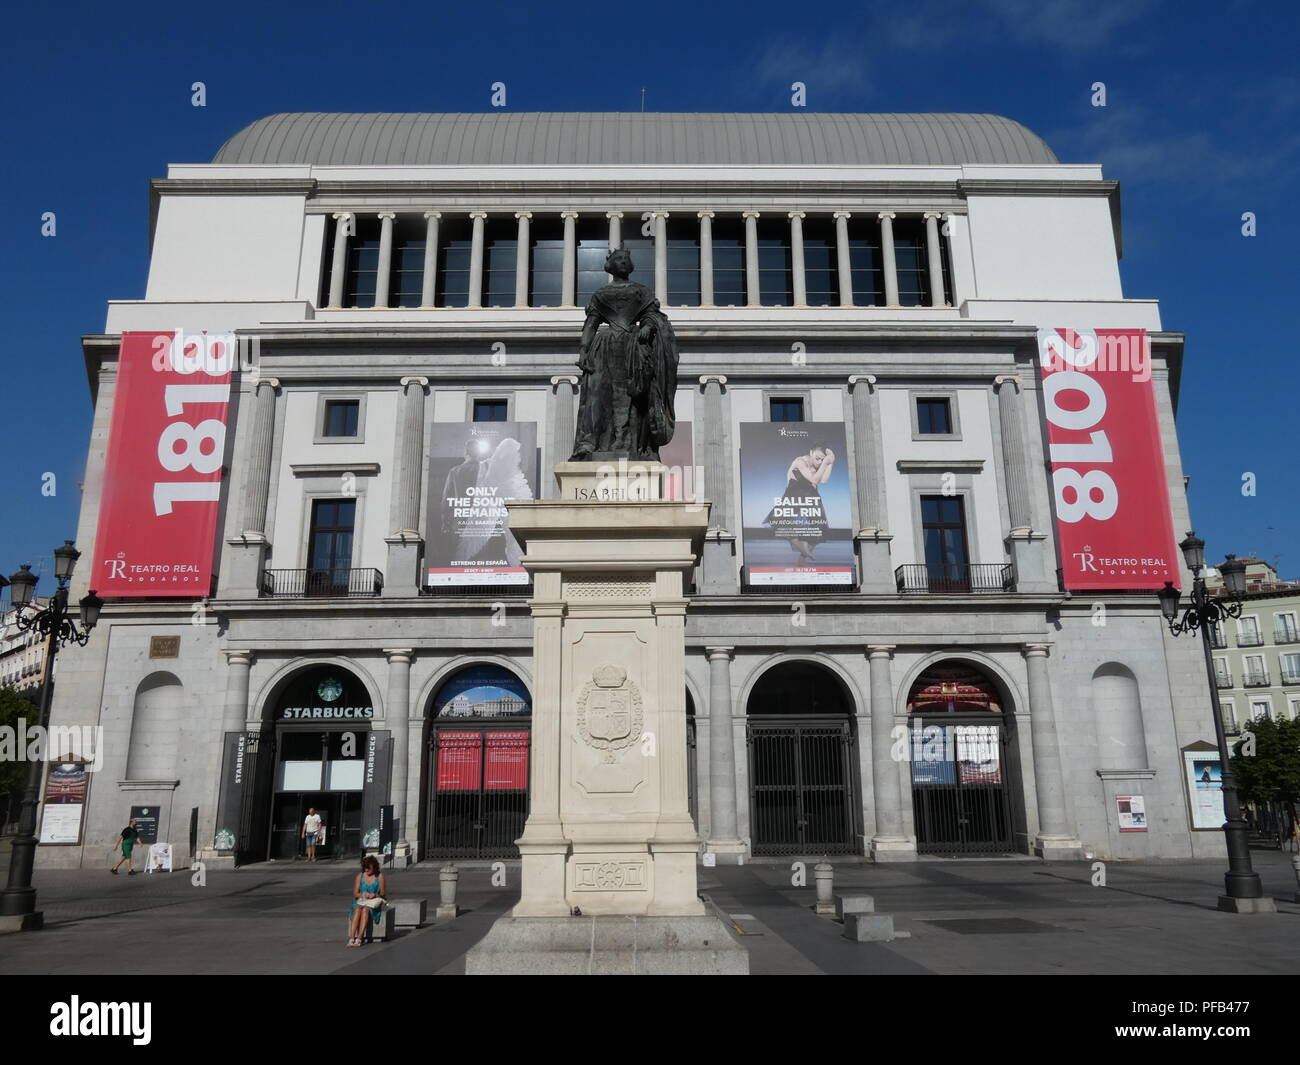 Madrid city centre - Stock Image